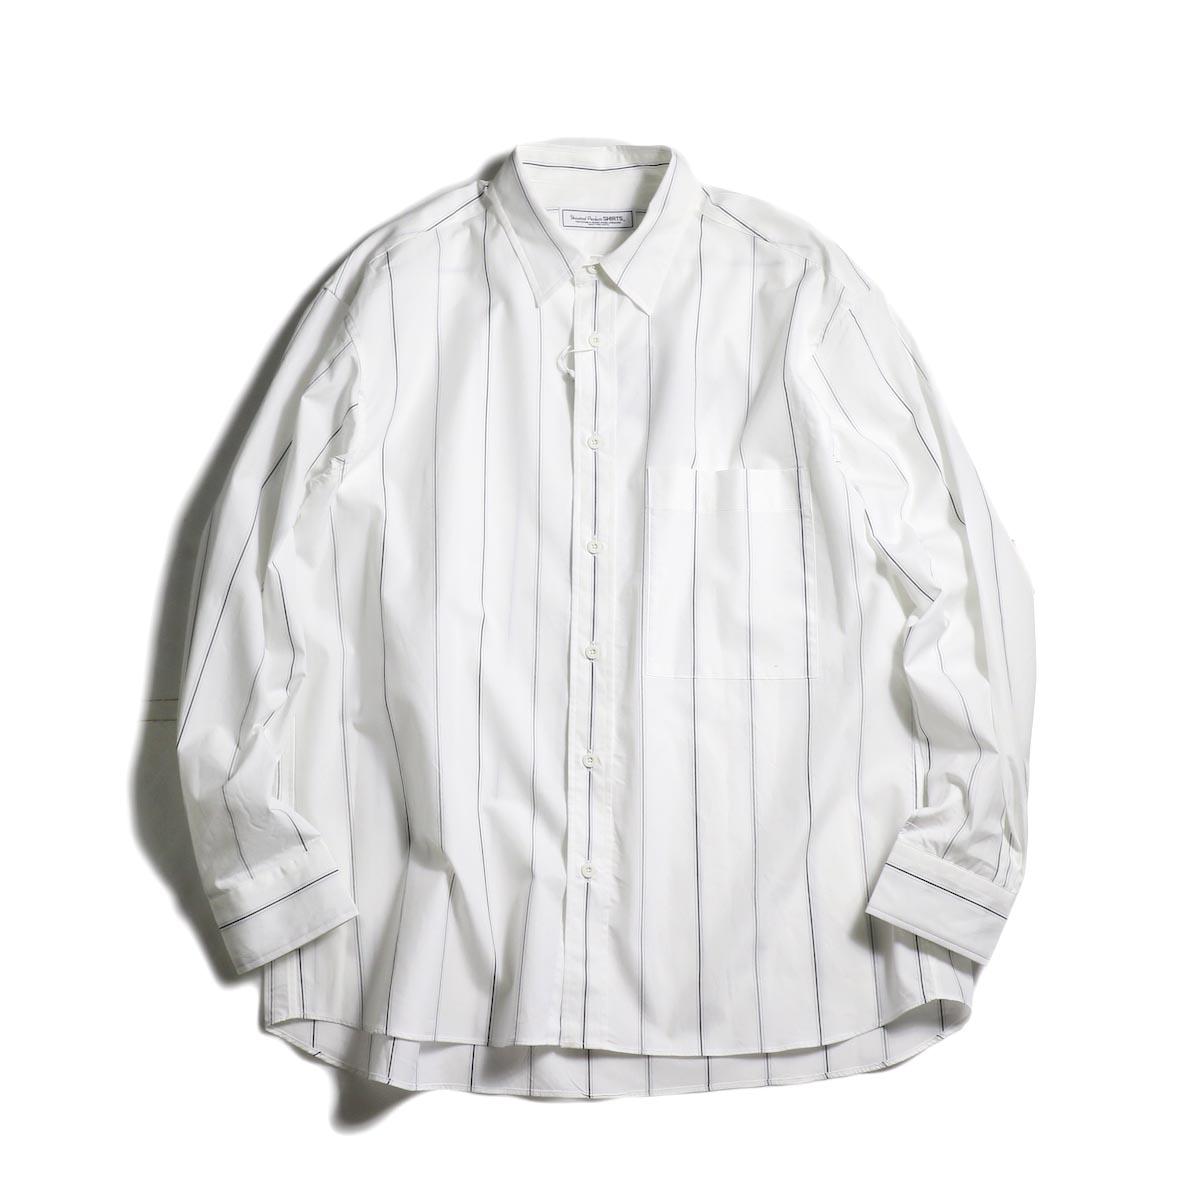 UNIVERSAL PRODUCTS / STRIPE REGULAR COLLAR SHIRT (White Stripe)